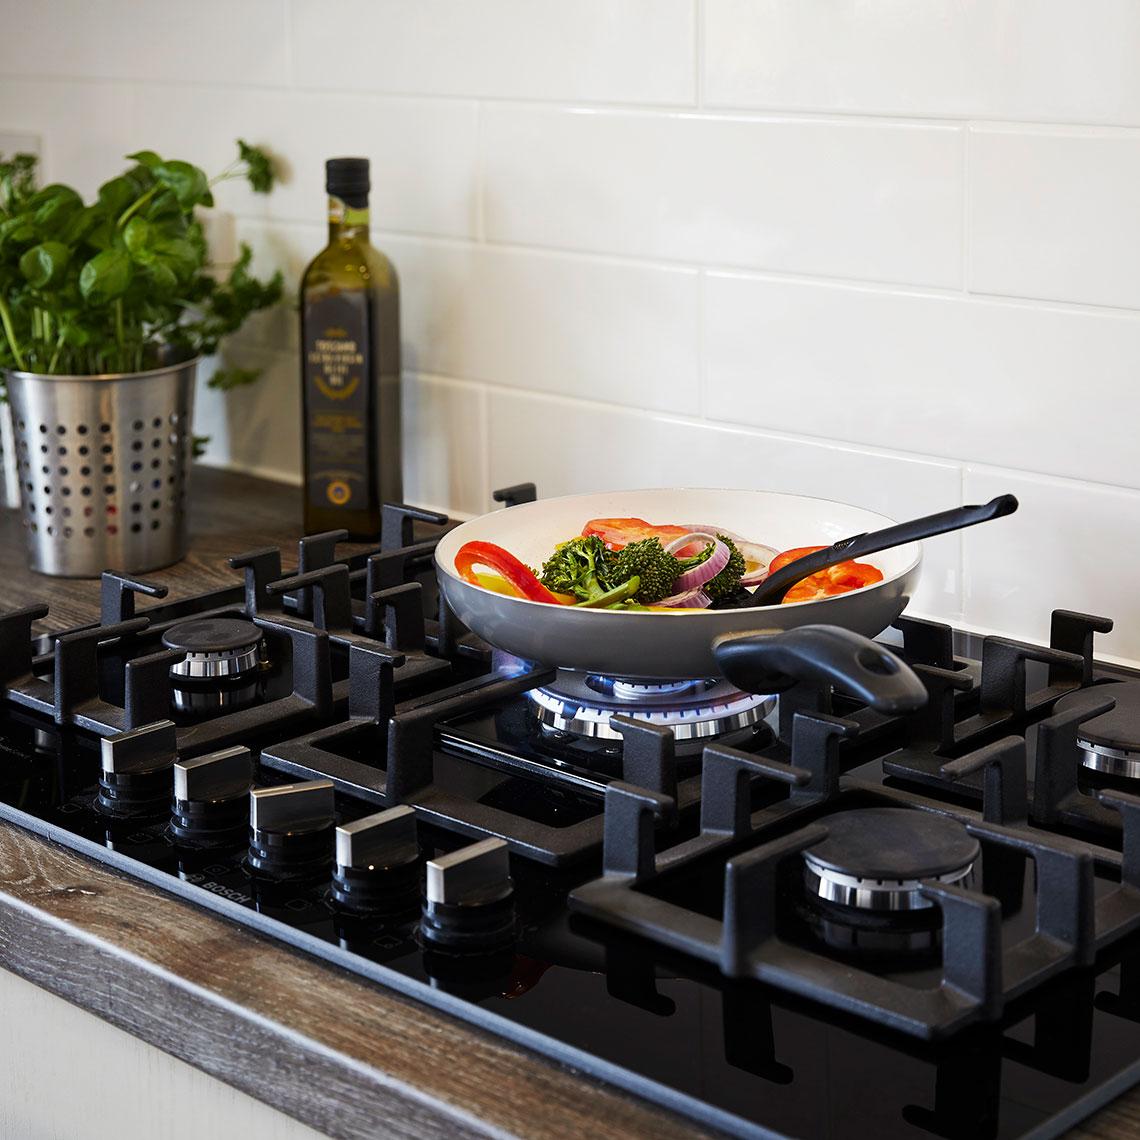 Luxury Kitchens and Utilities